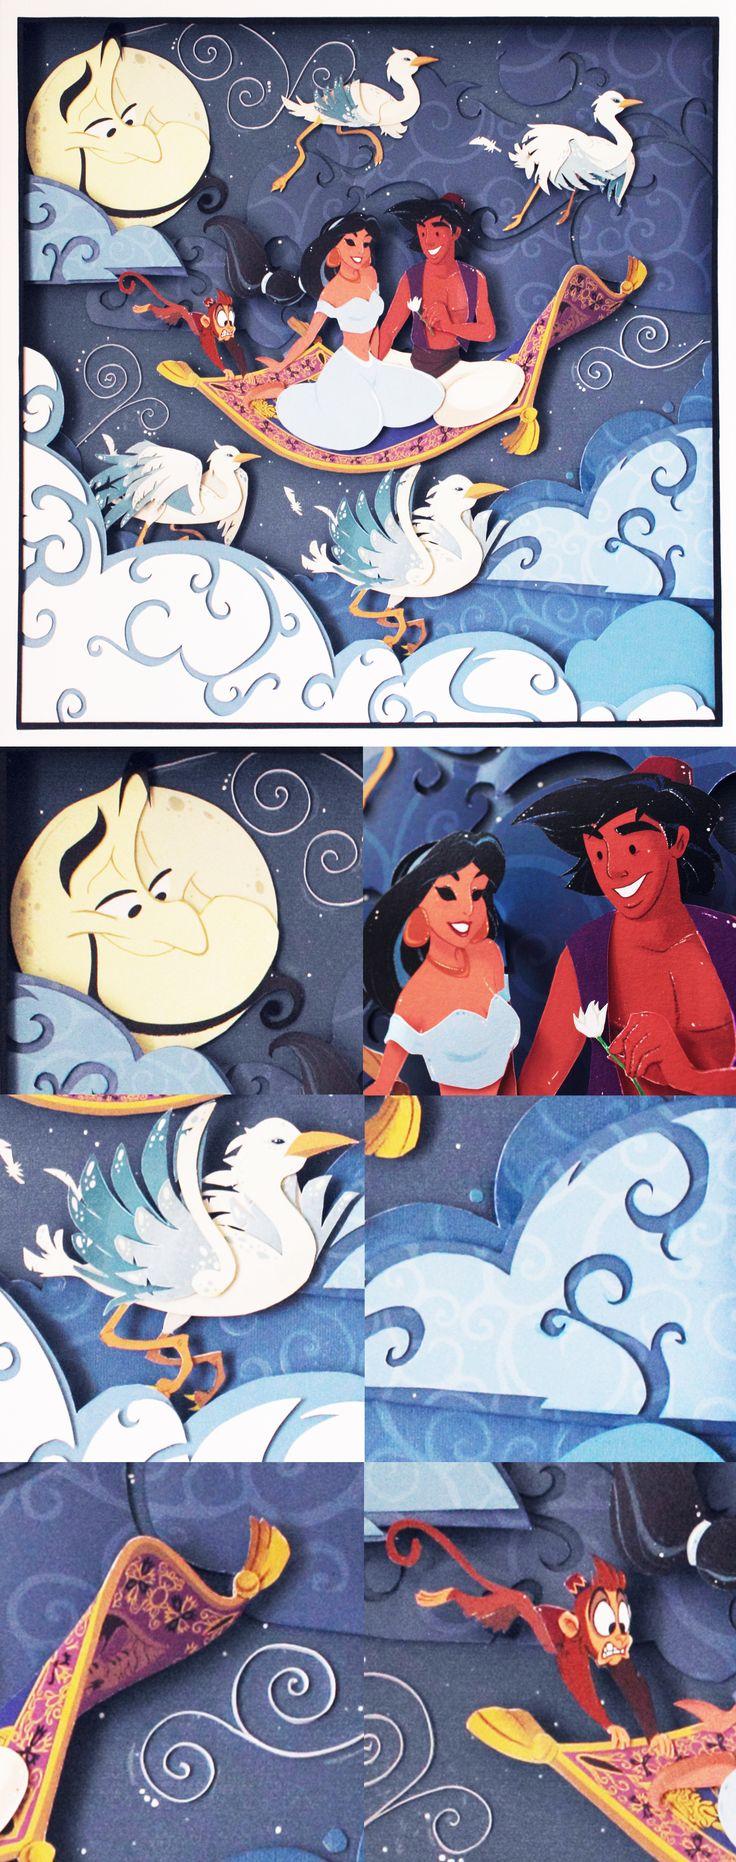 Amazing paper illustration!!  Disney Aladdin Paper Art: A Whole New World - Handmade Illustration of Aladdin and Princess Jasmine on the Magic Carpet with Abu and Genie!  https://www.etsy.com/it/listing/196643125/disney-aladdin-il-mondo-e-mio?ref=pr_shop&langid_override=0